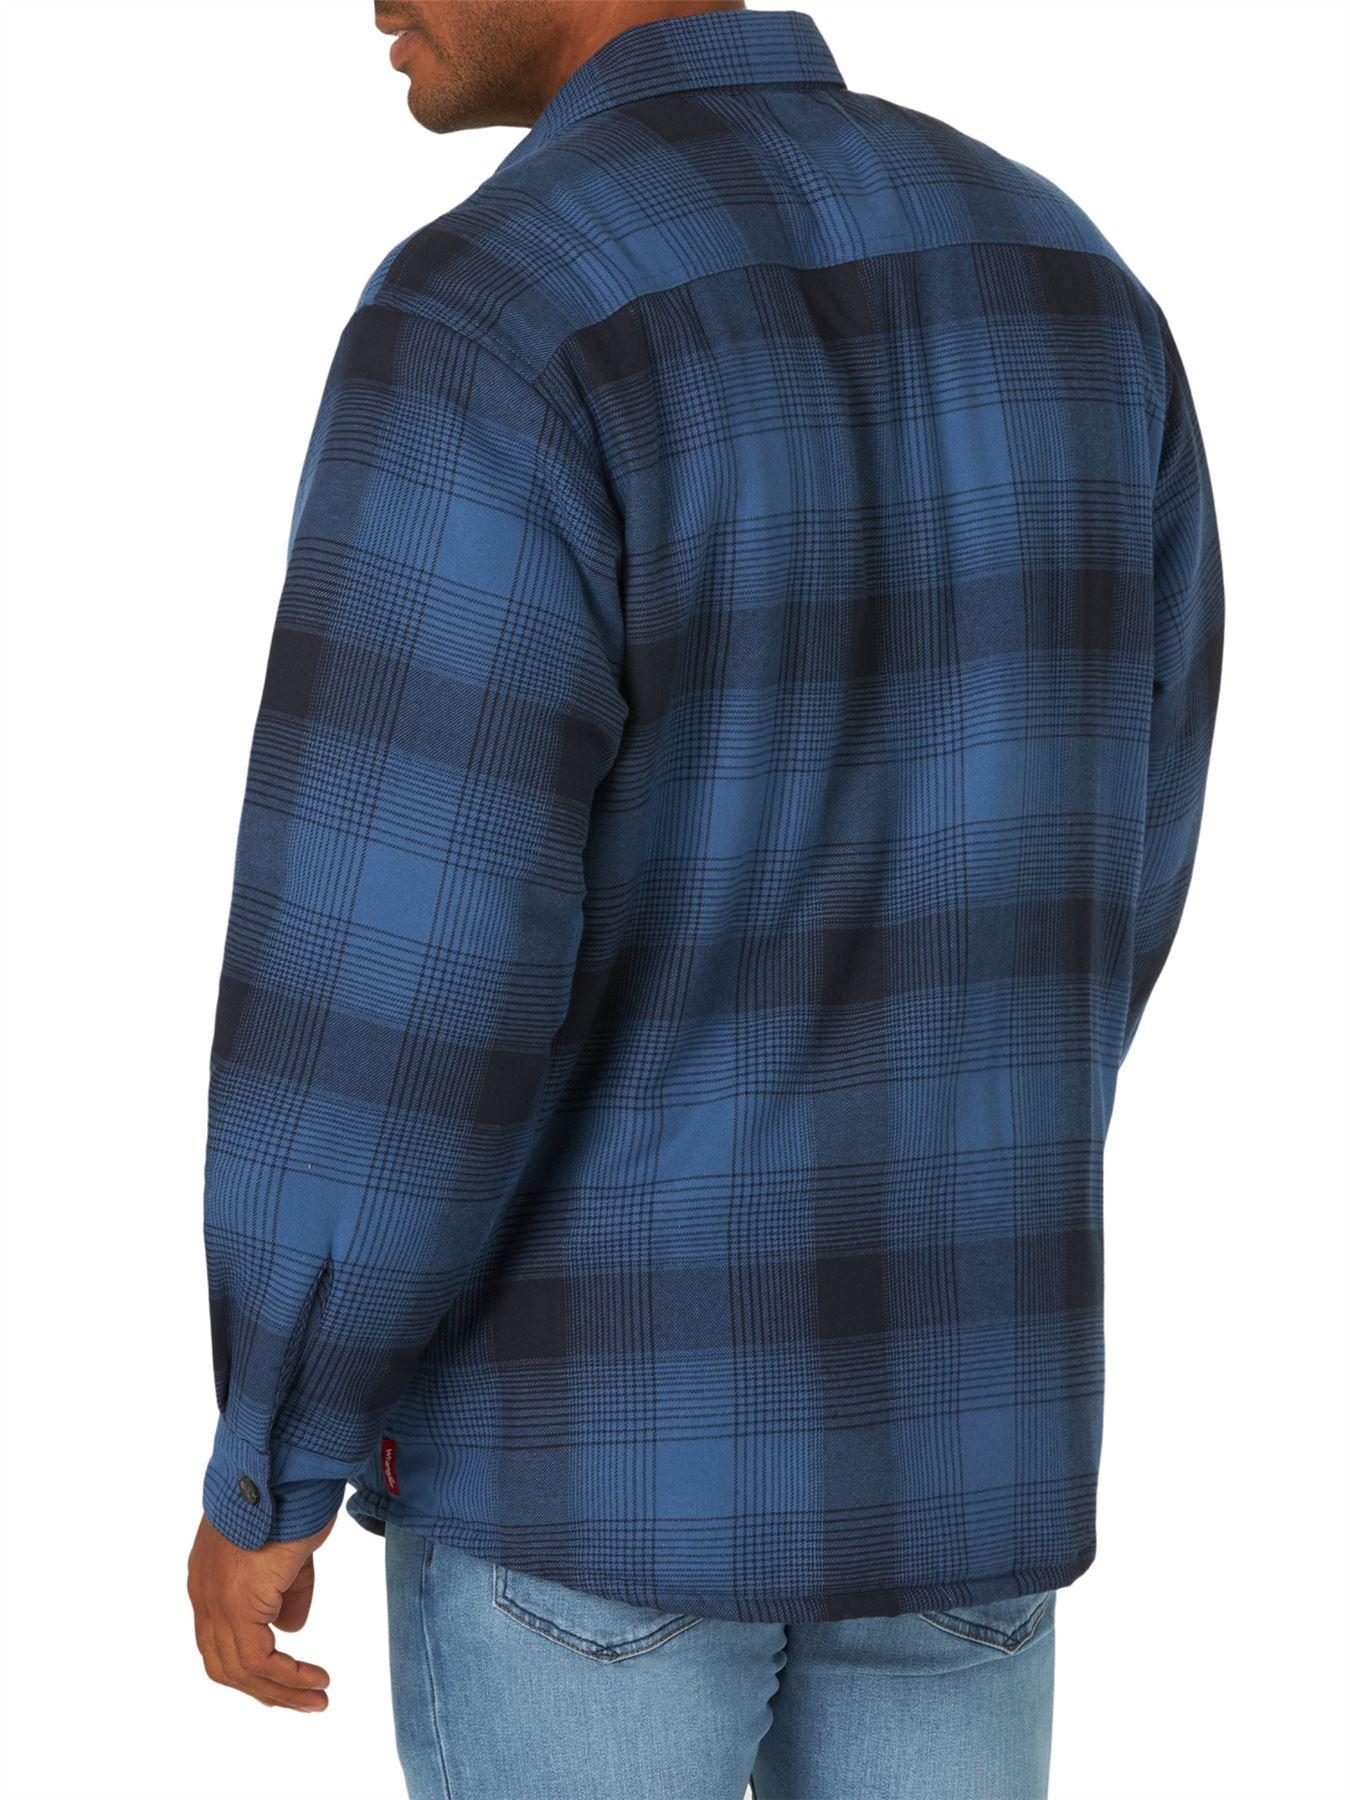 miniature 3 - Homme-Wrangler-Sherpa-Polaire-Double-Lumberjack-Rembourre-Veste-Chemise-Boutonnee